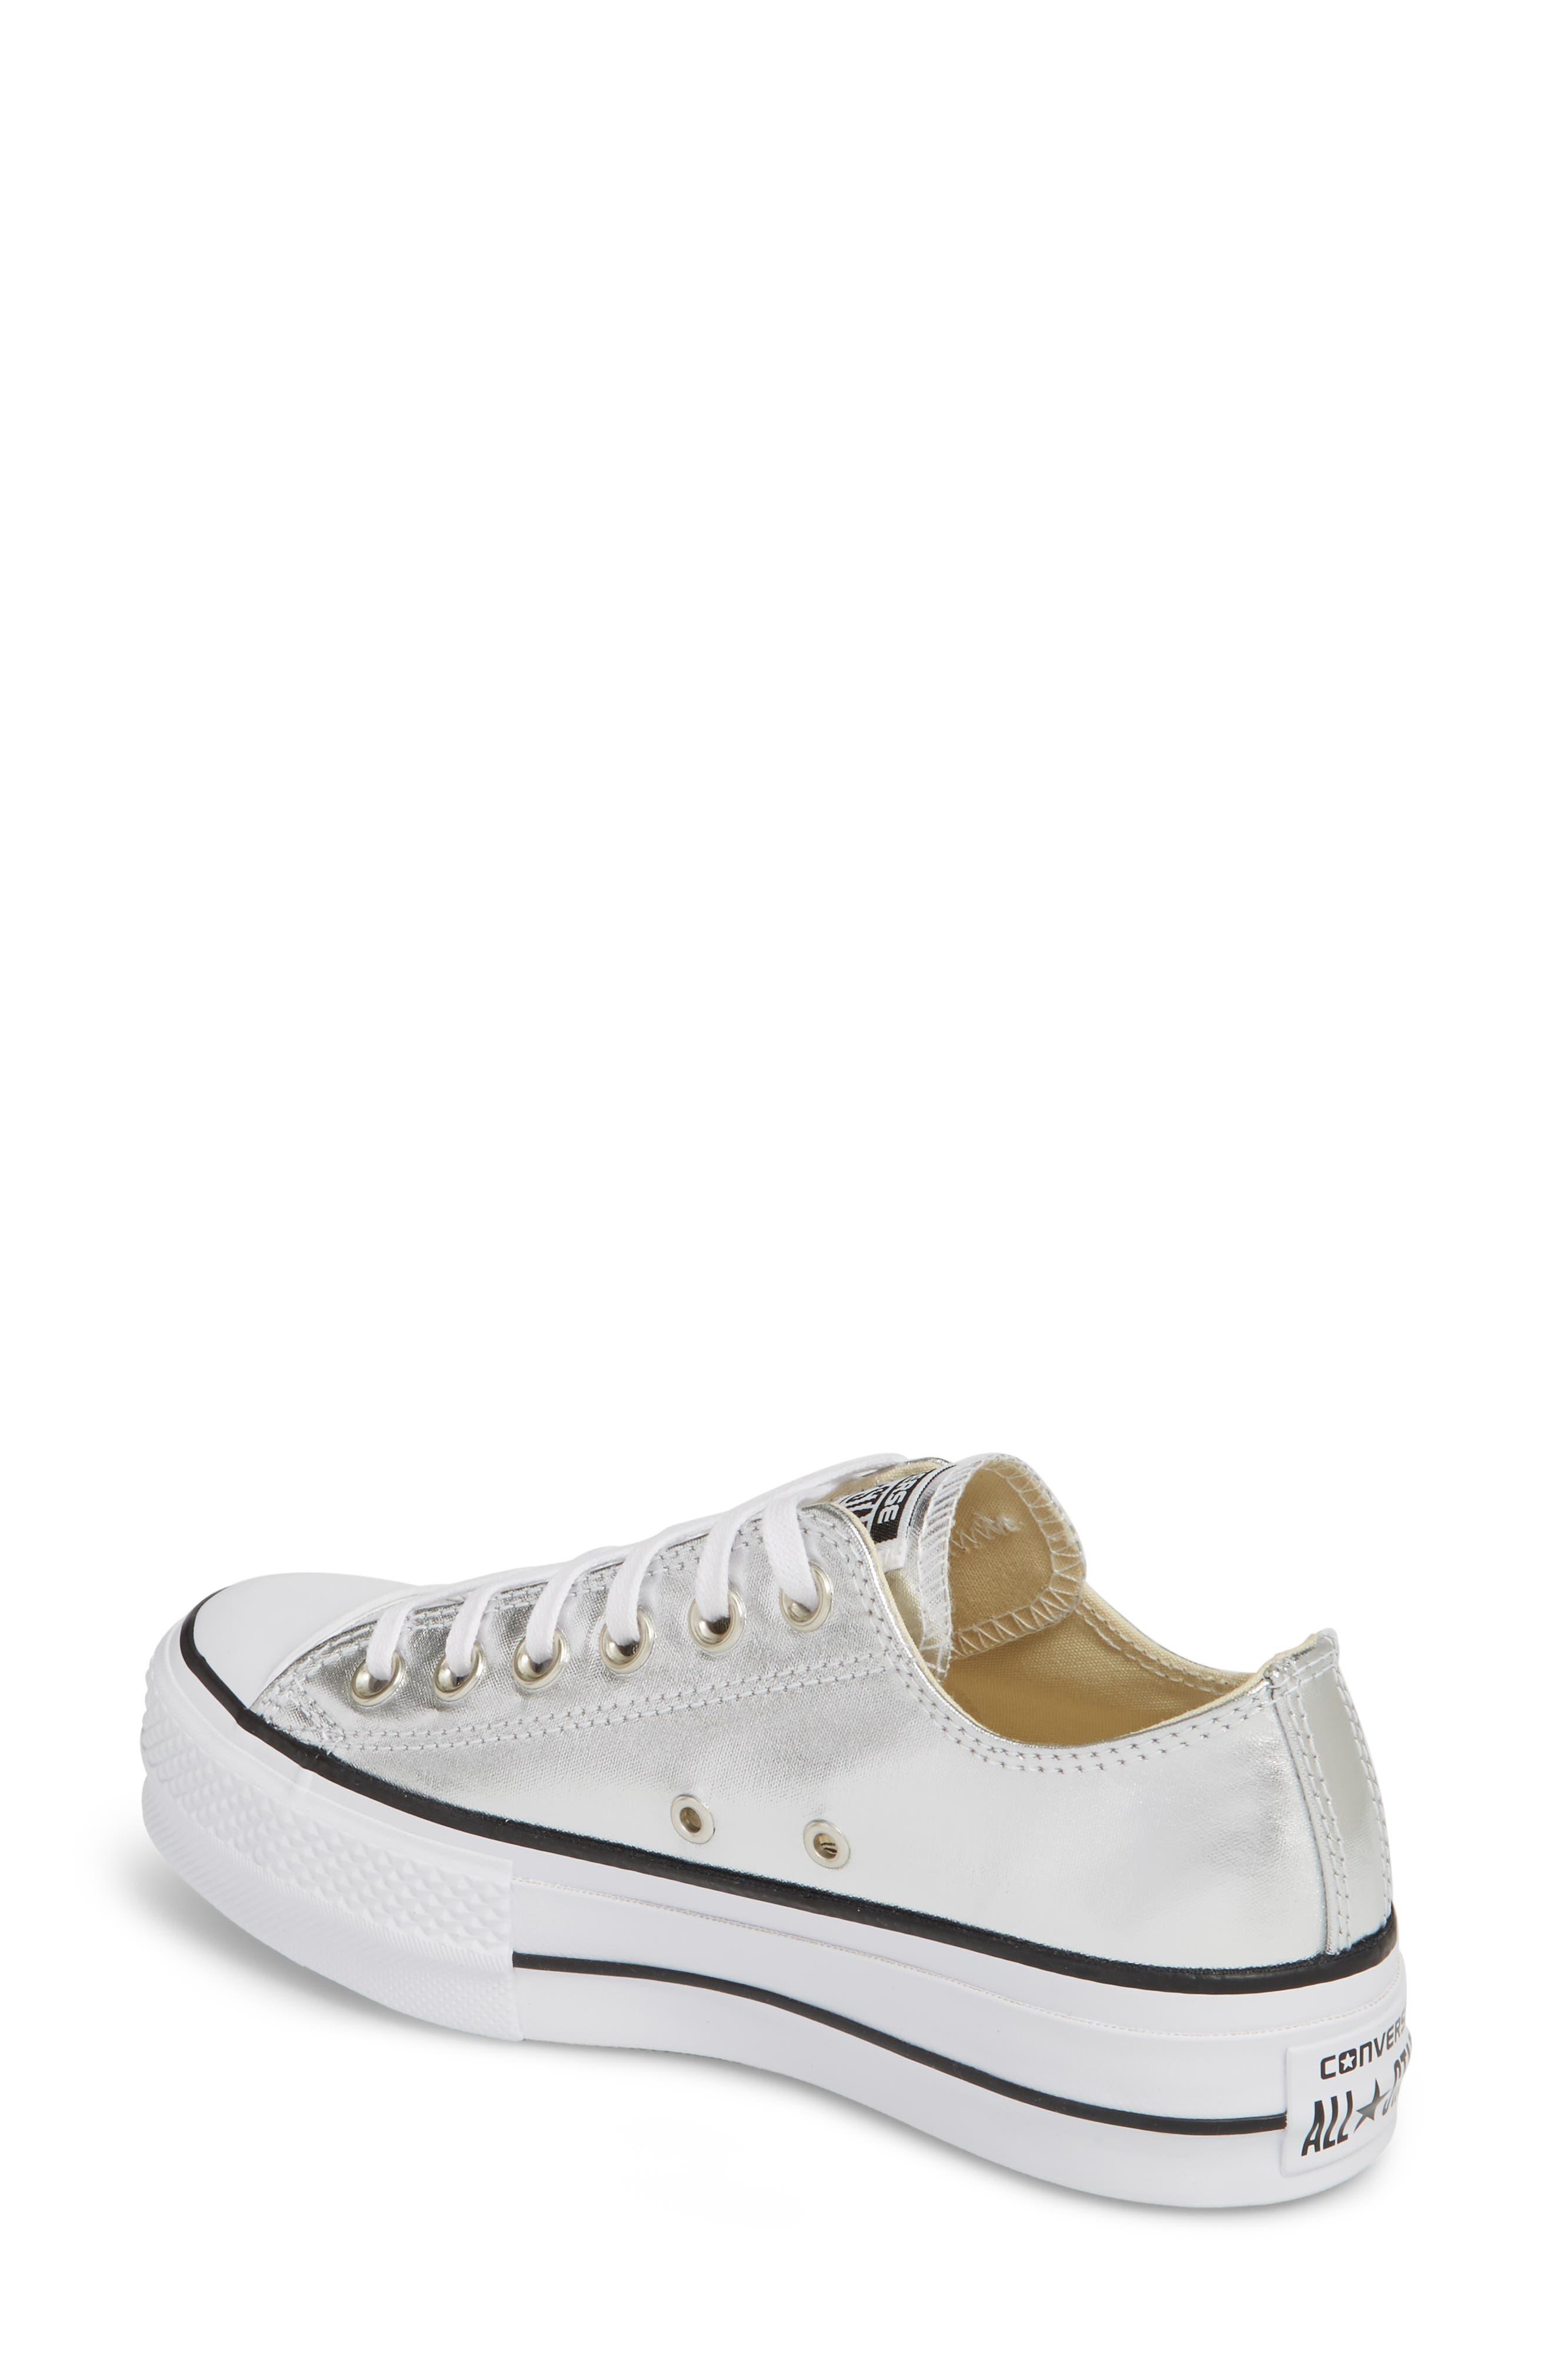 Chuck Taylor<sup>®</sup> All Star Platform Sneaker,                             Alternate thumbnail 2, color,                             Silver/ Black